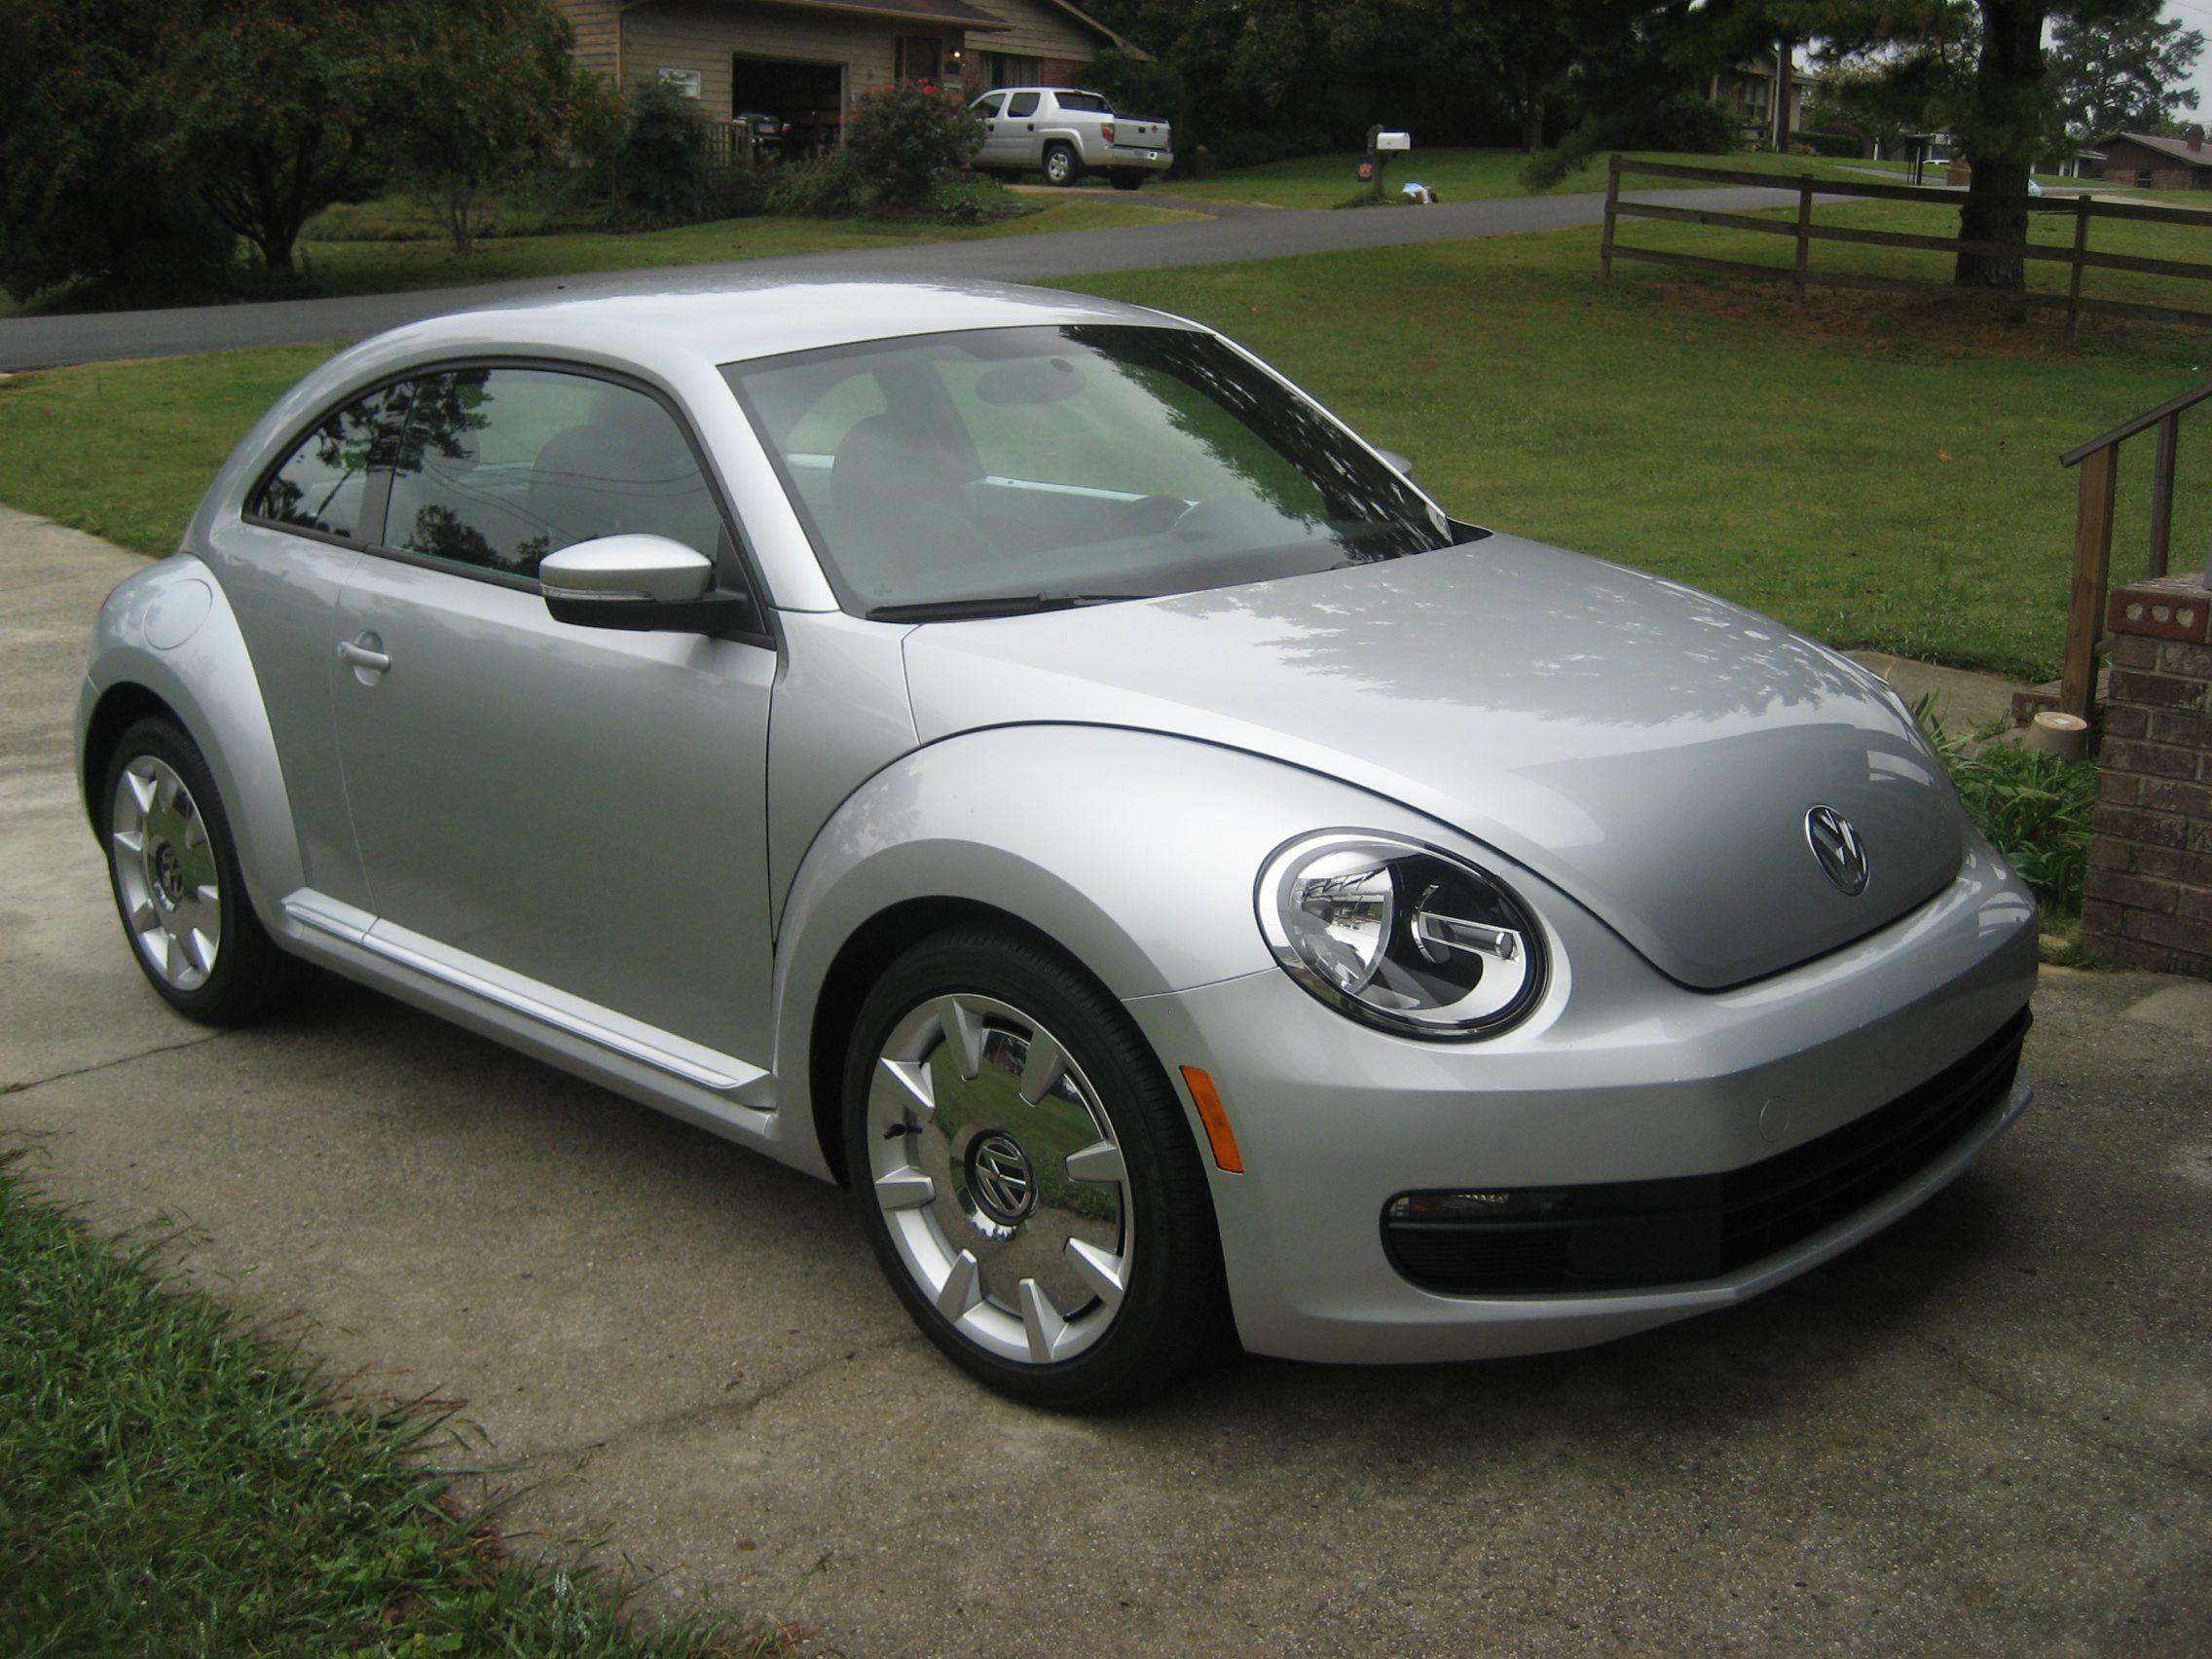 my new 2012 VW Beetle